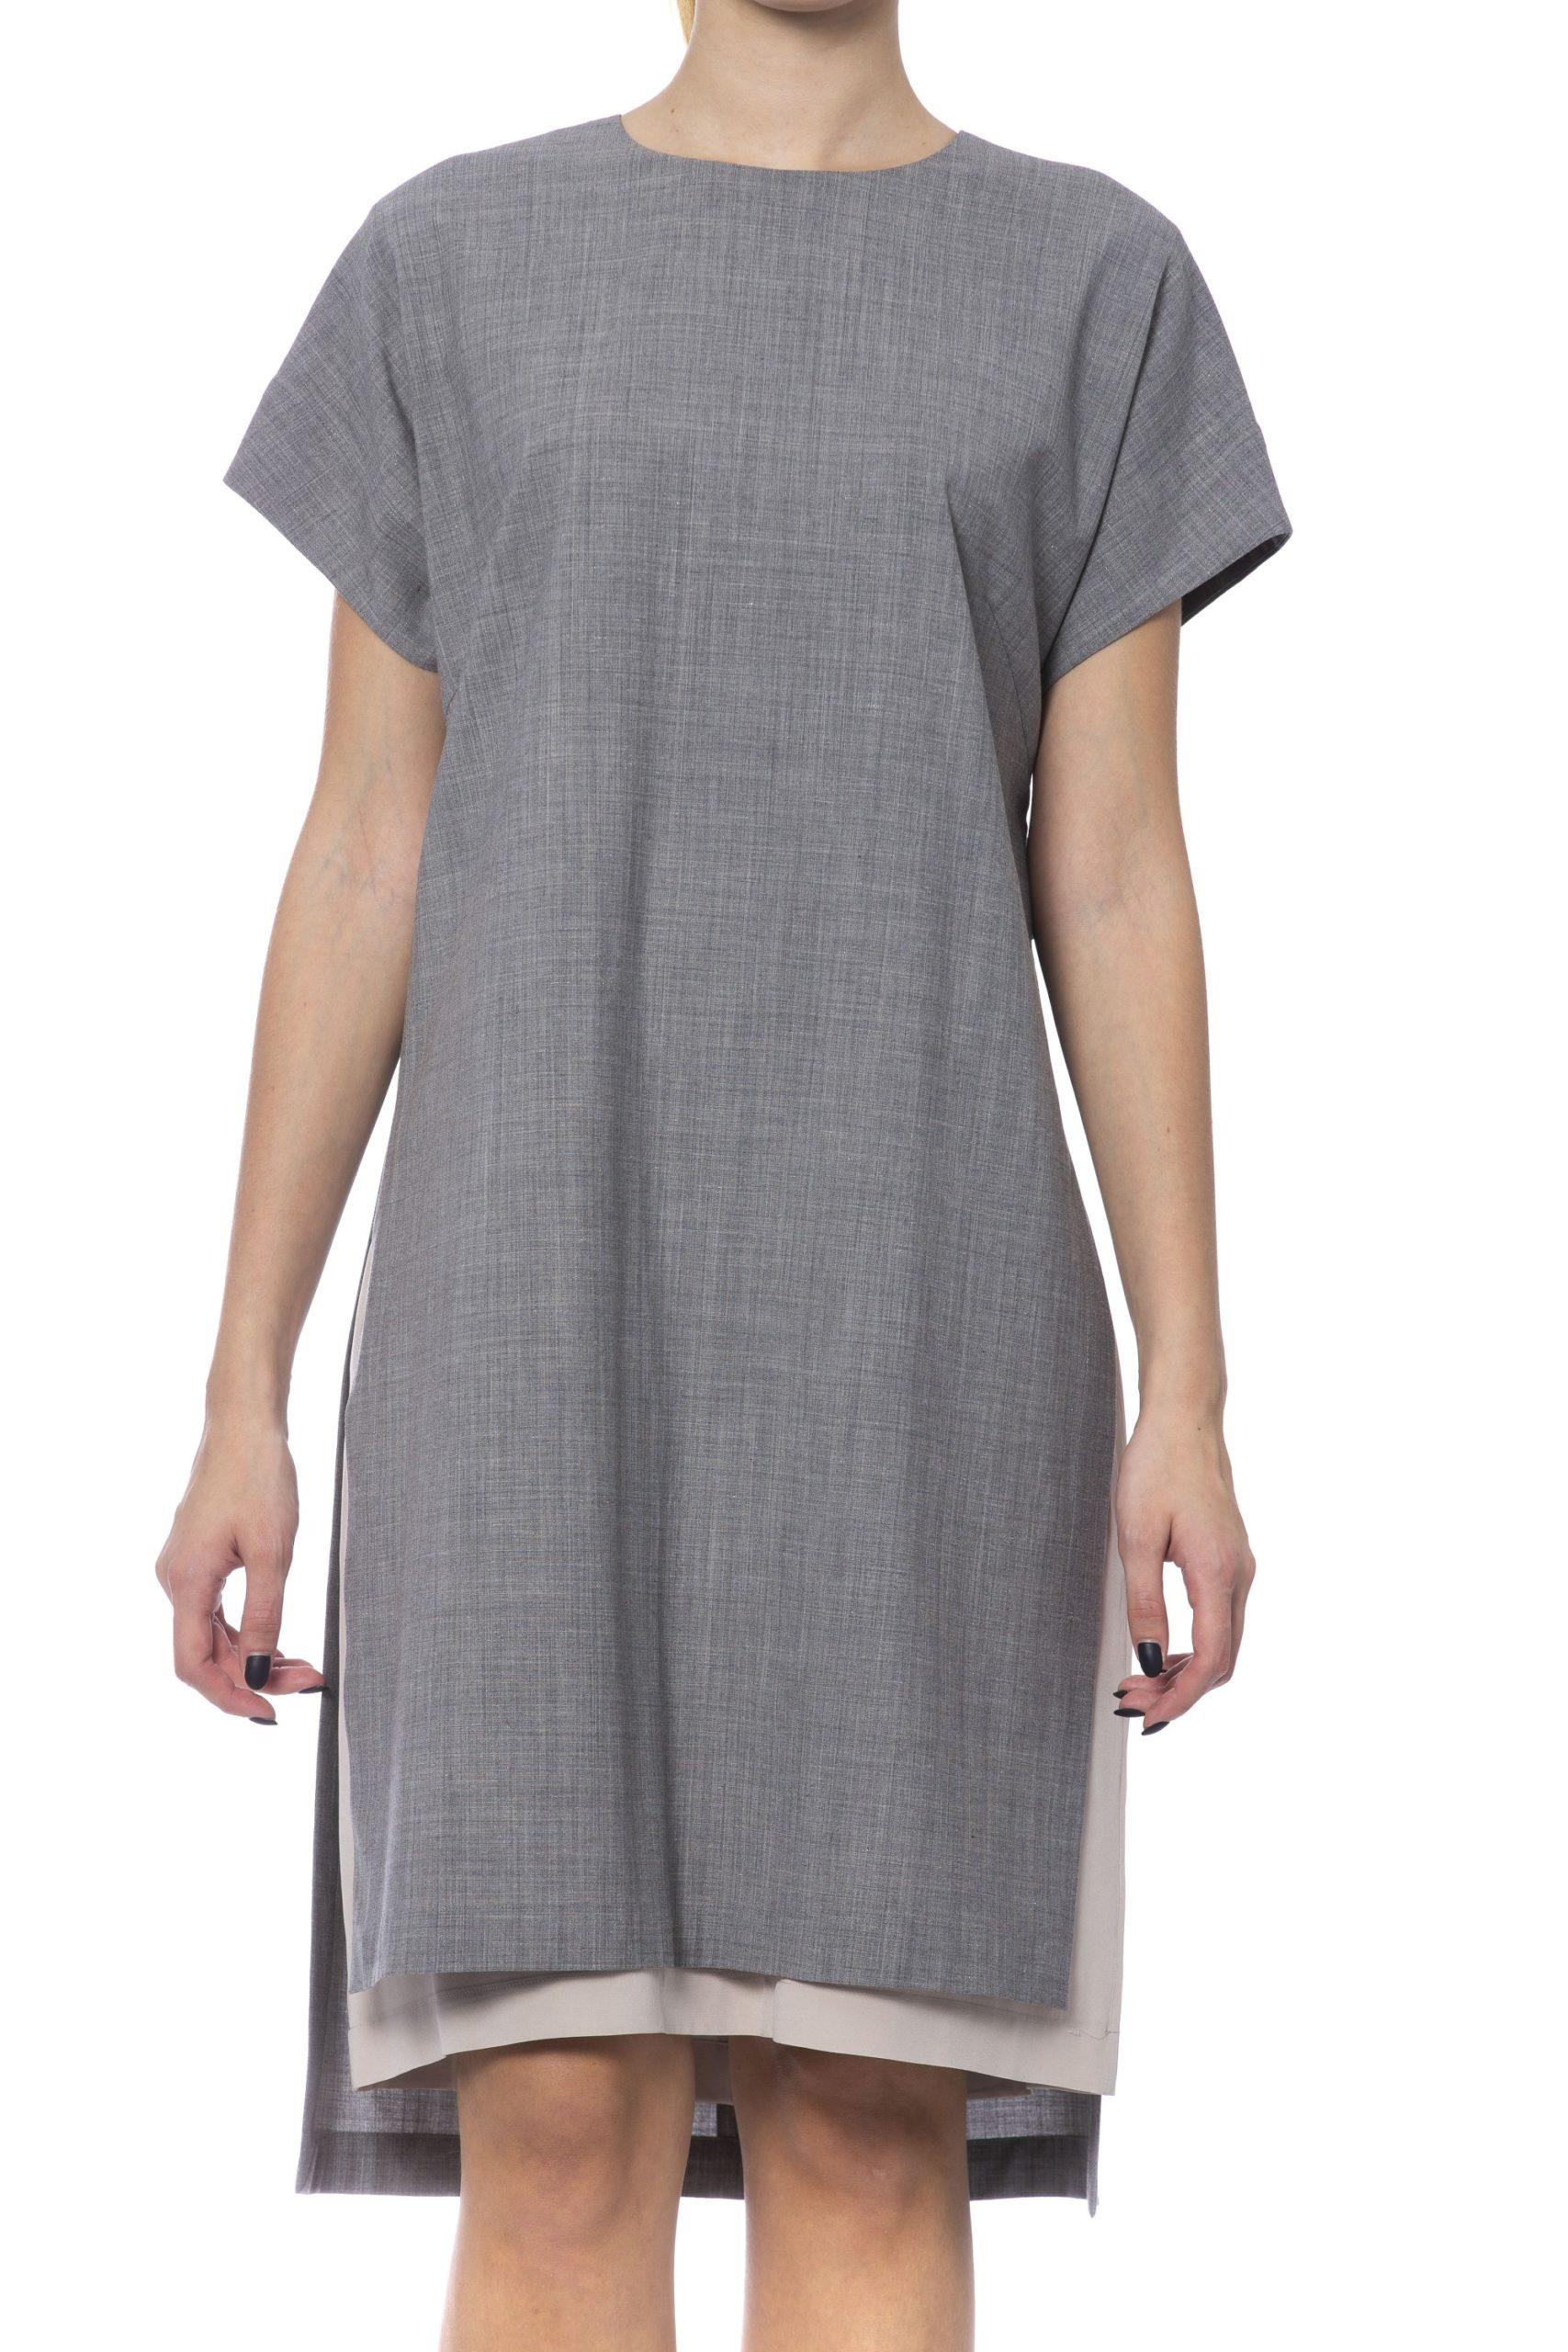 Peserico Women's Dress Grey PE992340 - IT42 | S